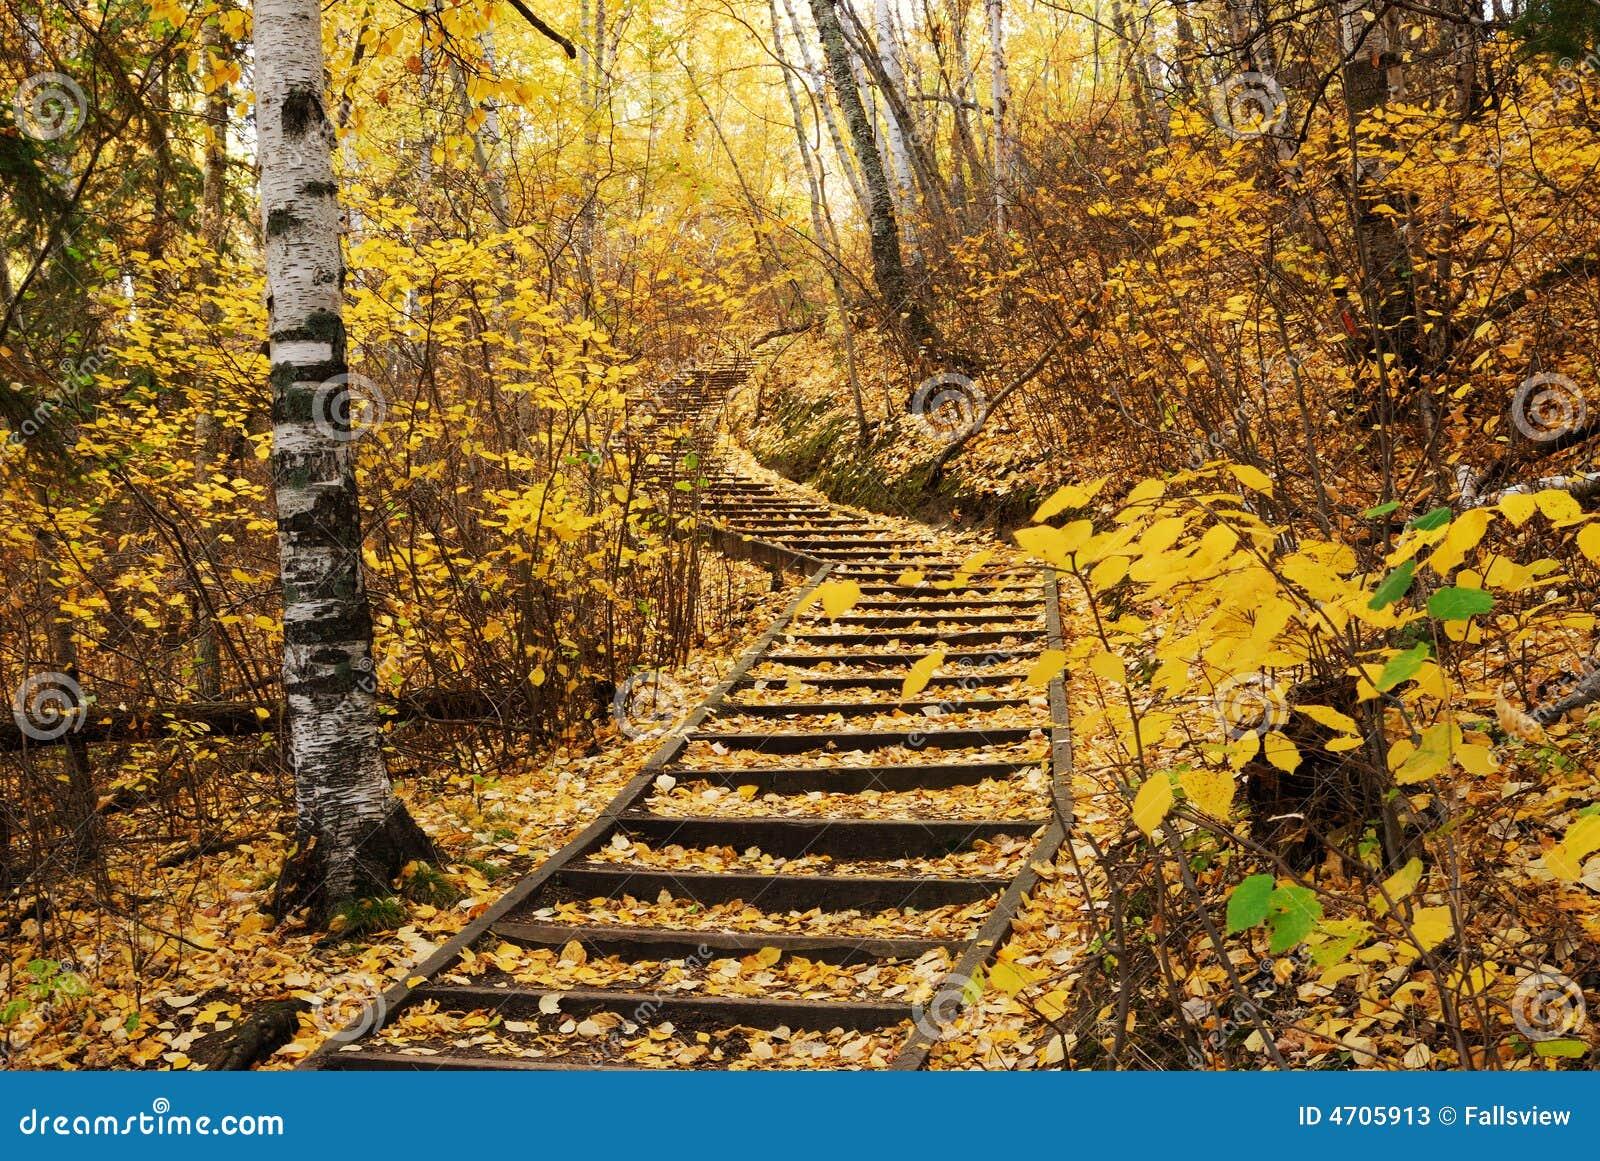 Wandernde Spur im Herbstwald